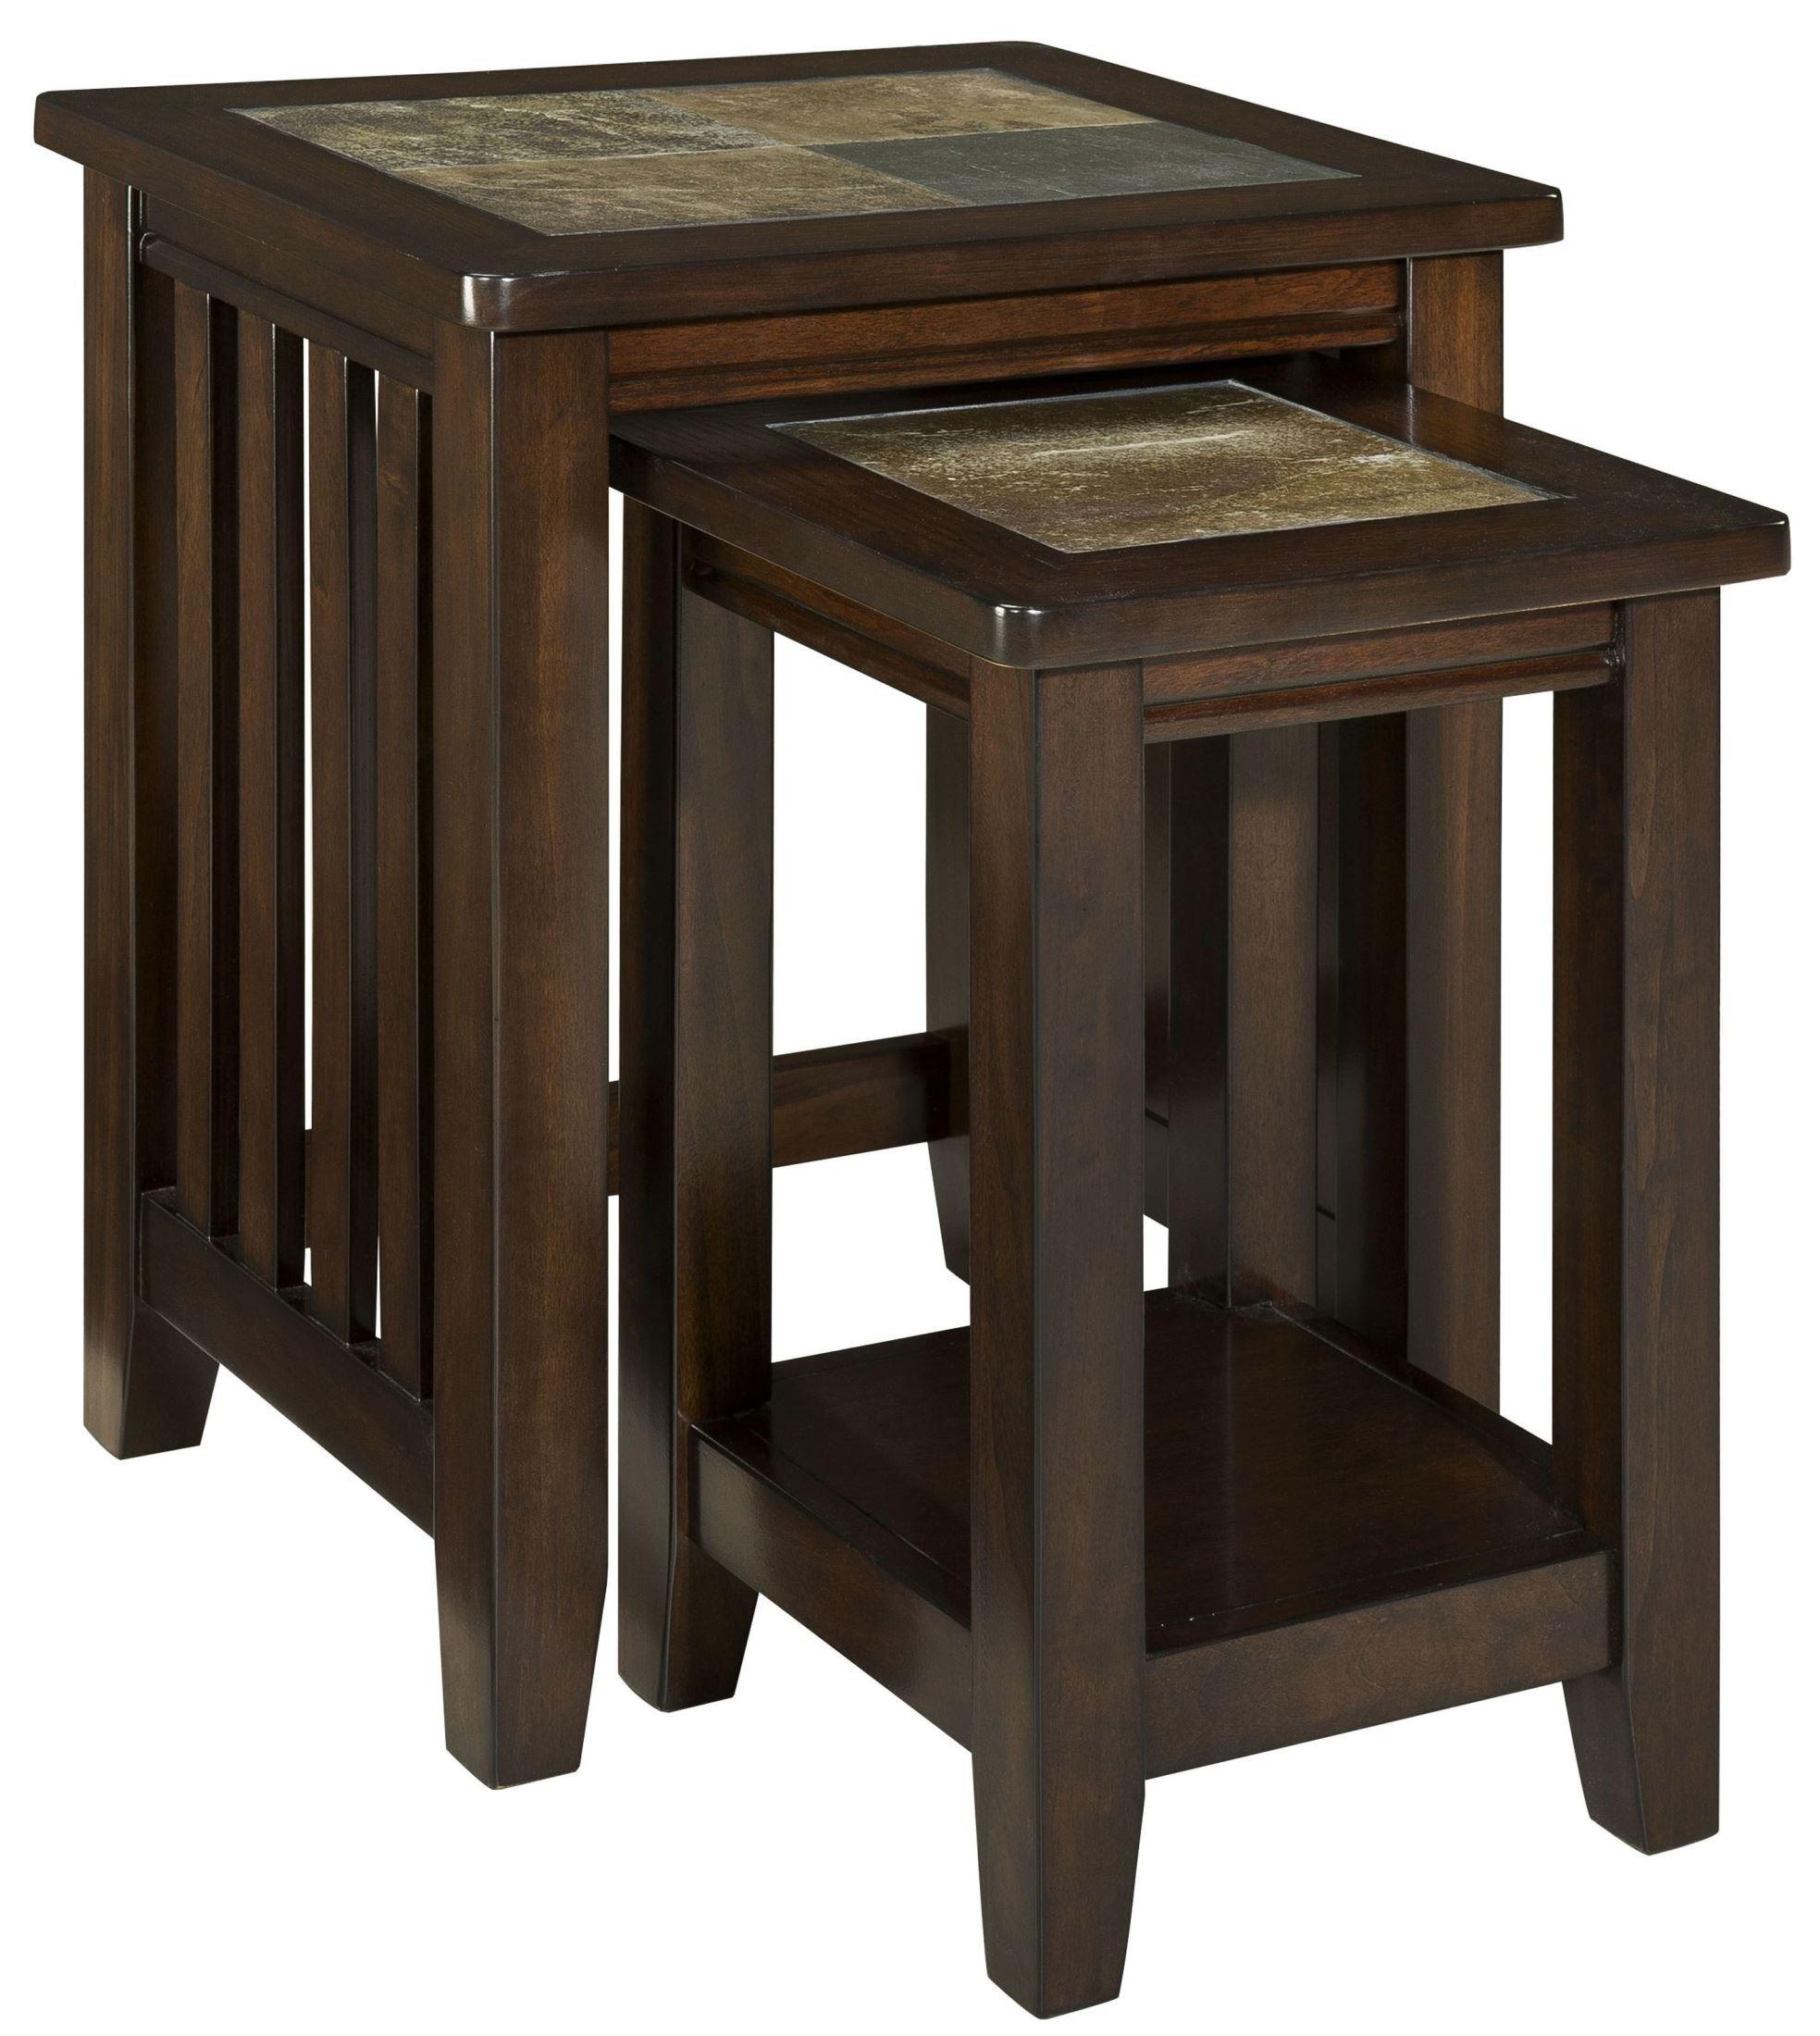 Napa valley brown oak nesting table standard